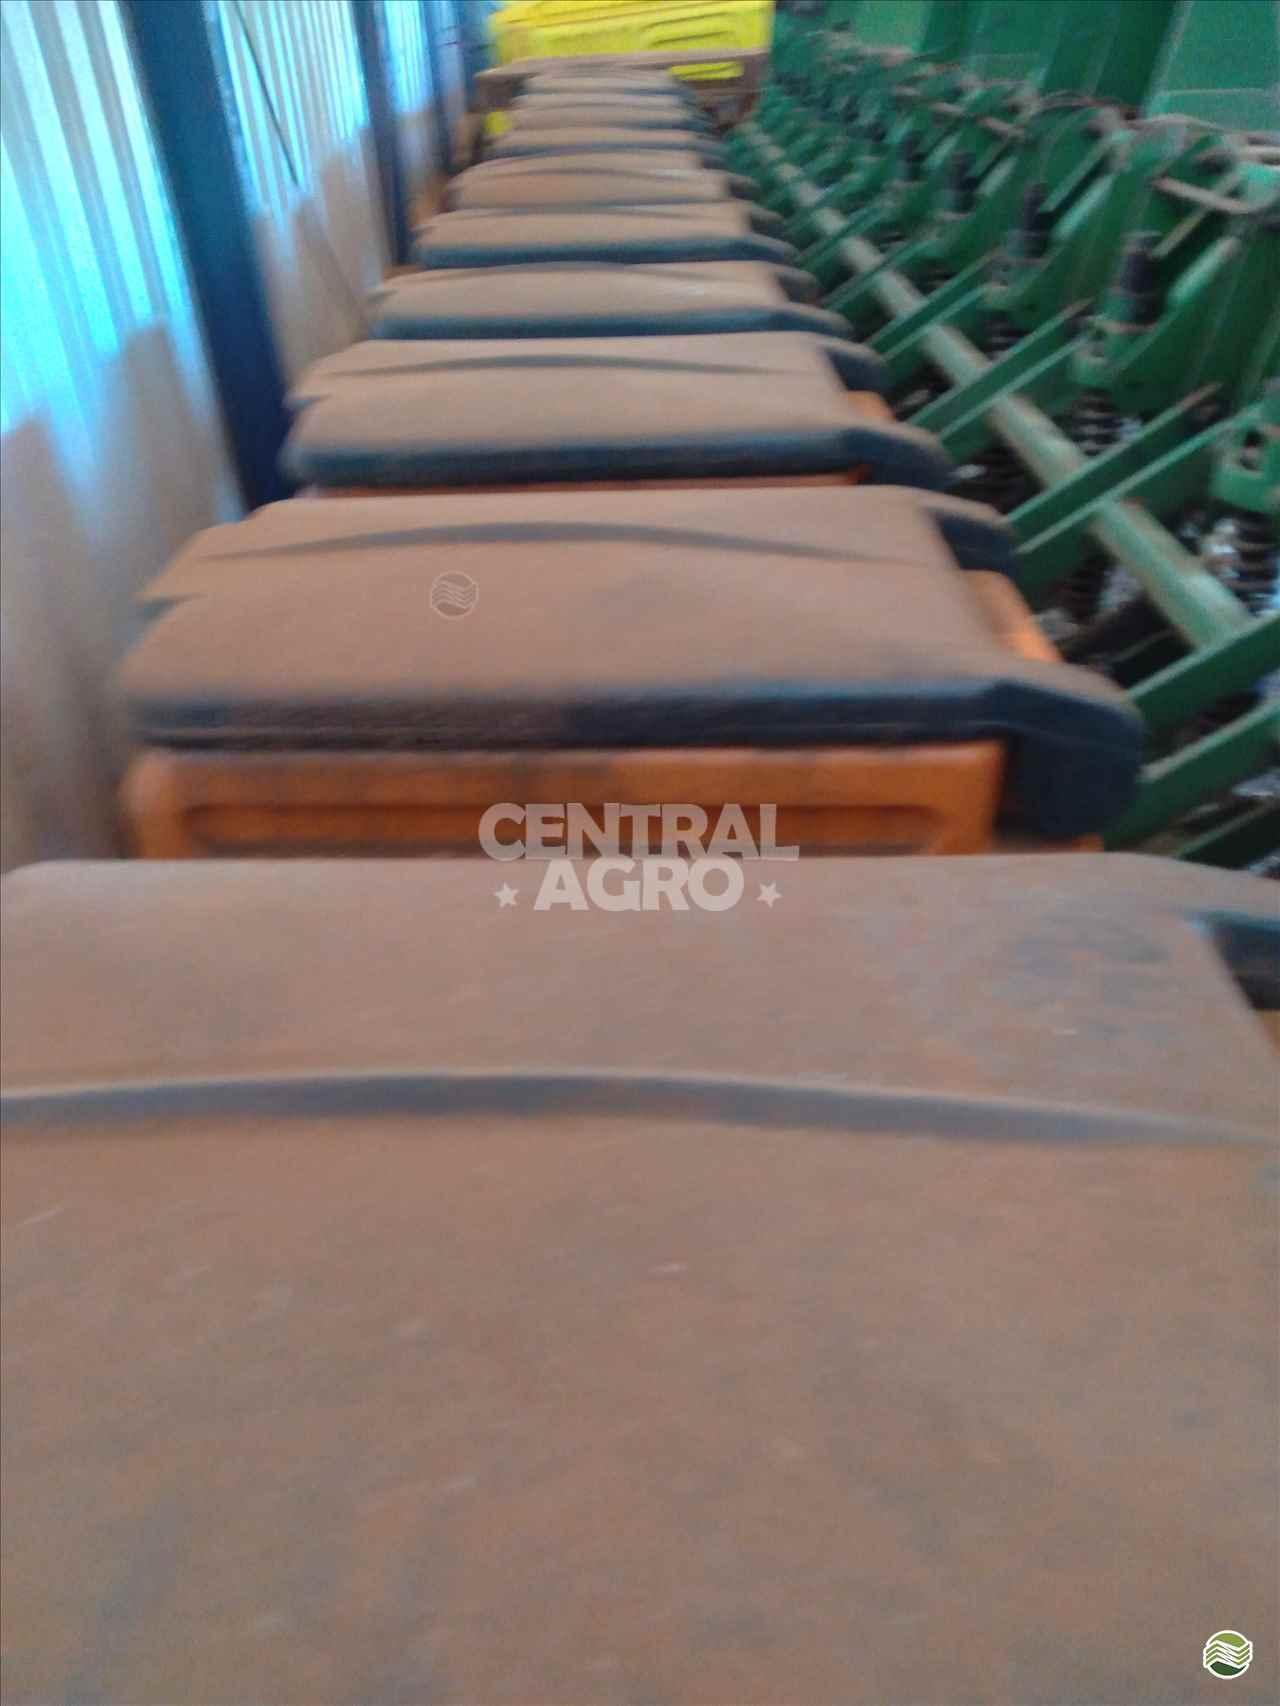 STARA HY-TECH SS 12000  2004/2004 Central Agro